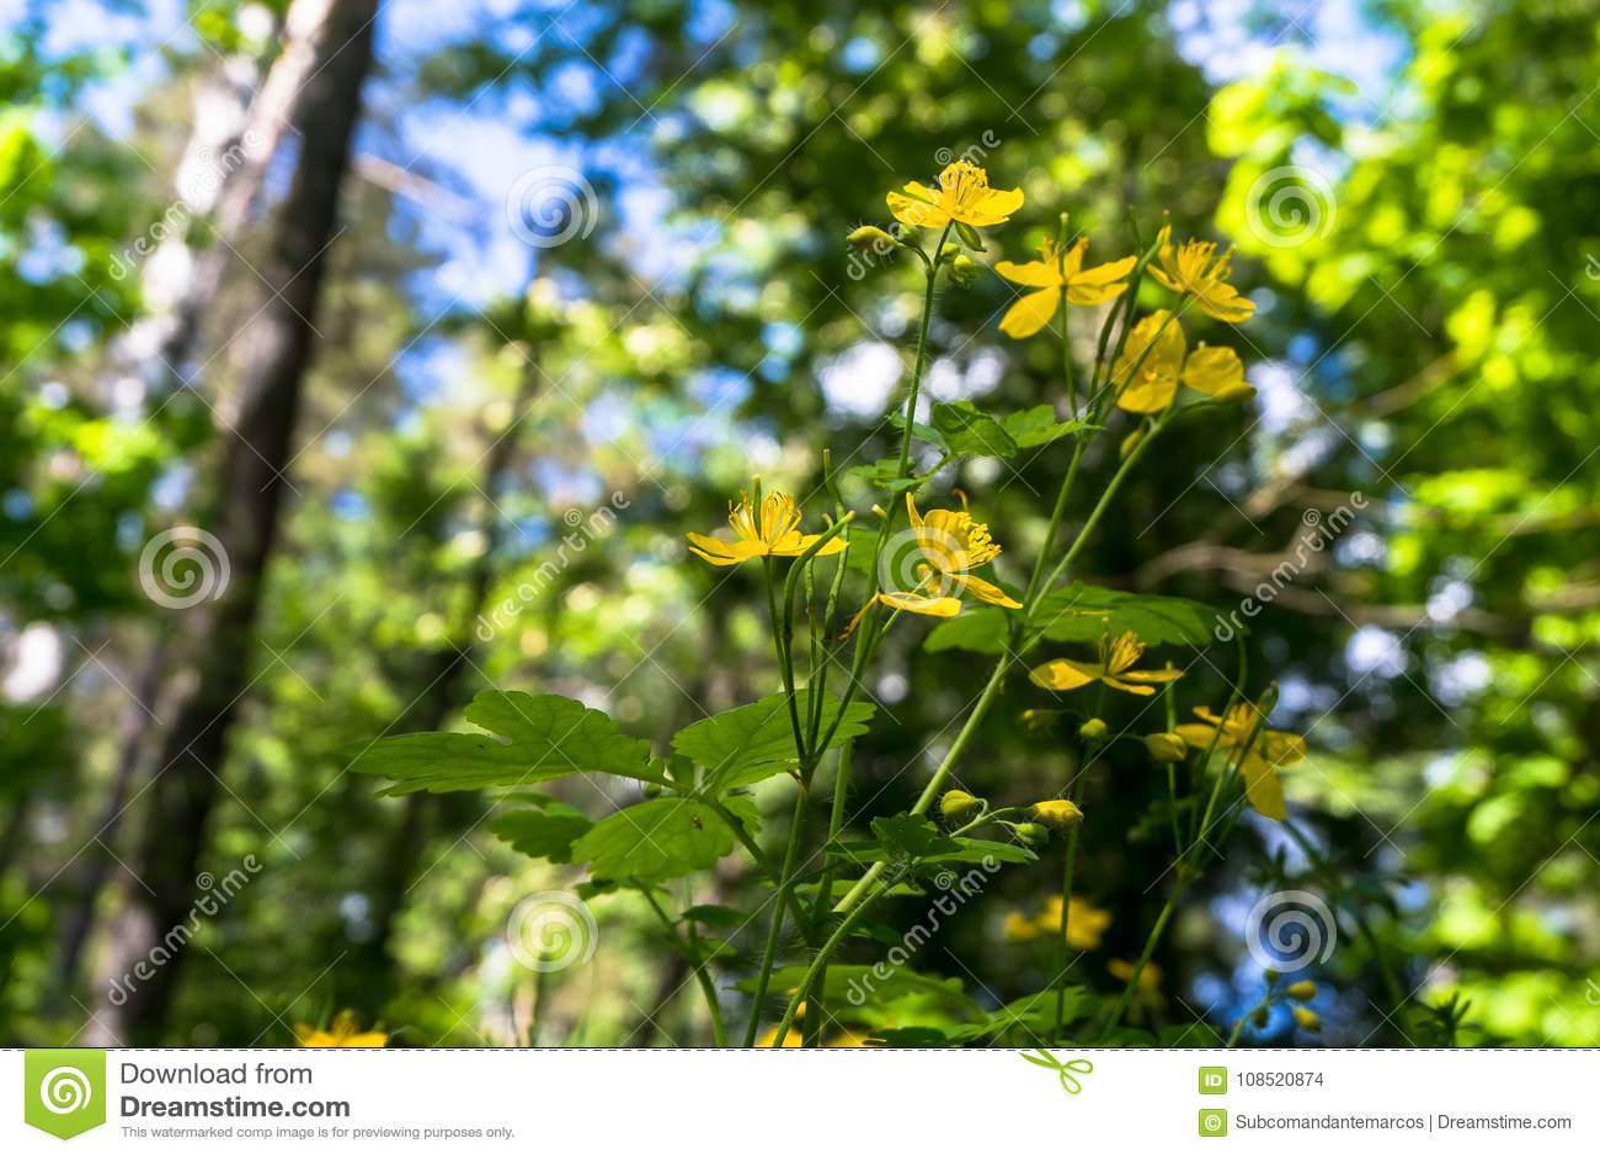 Cute Yellow Flowers Of Medicinal Herb Celandine Or Chelidonium Majus